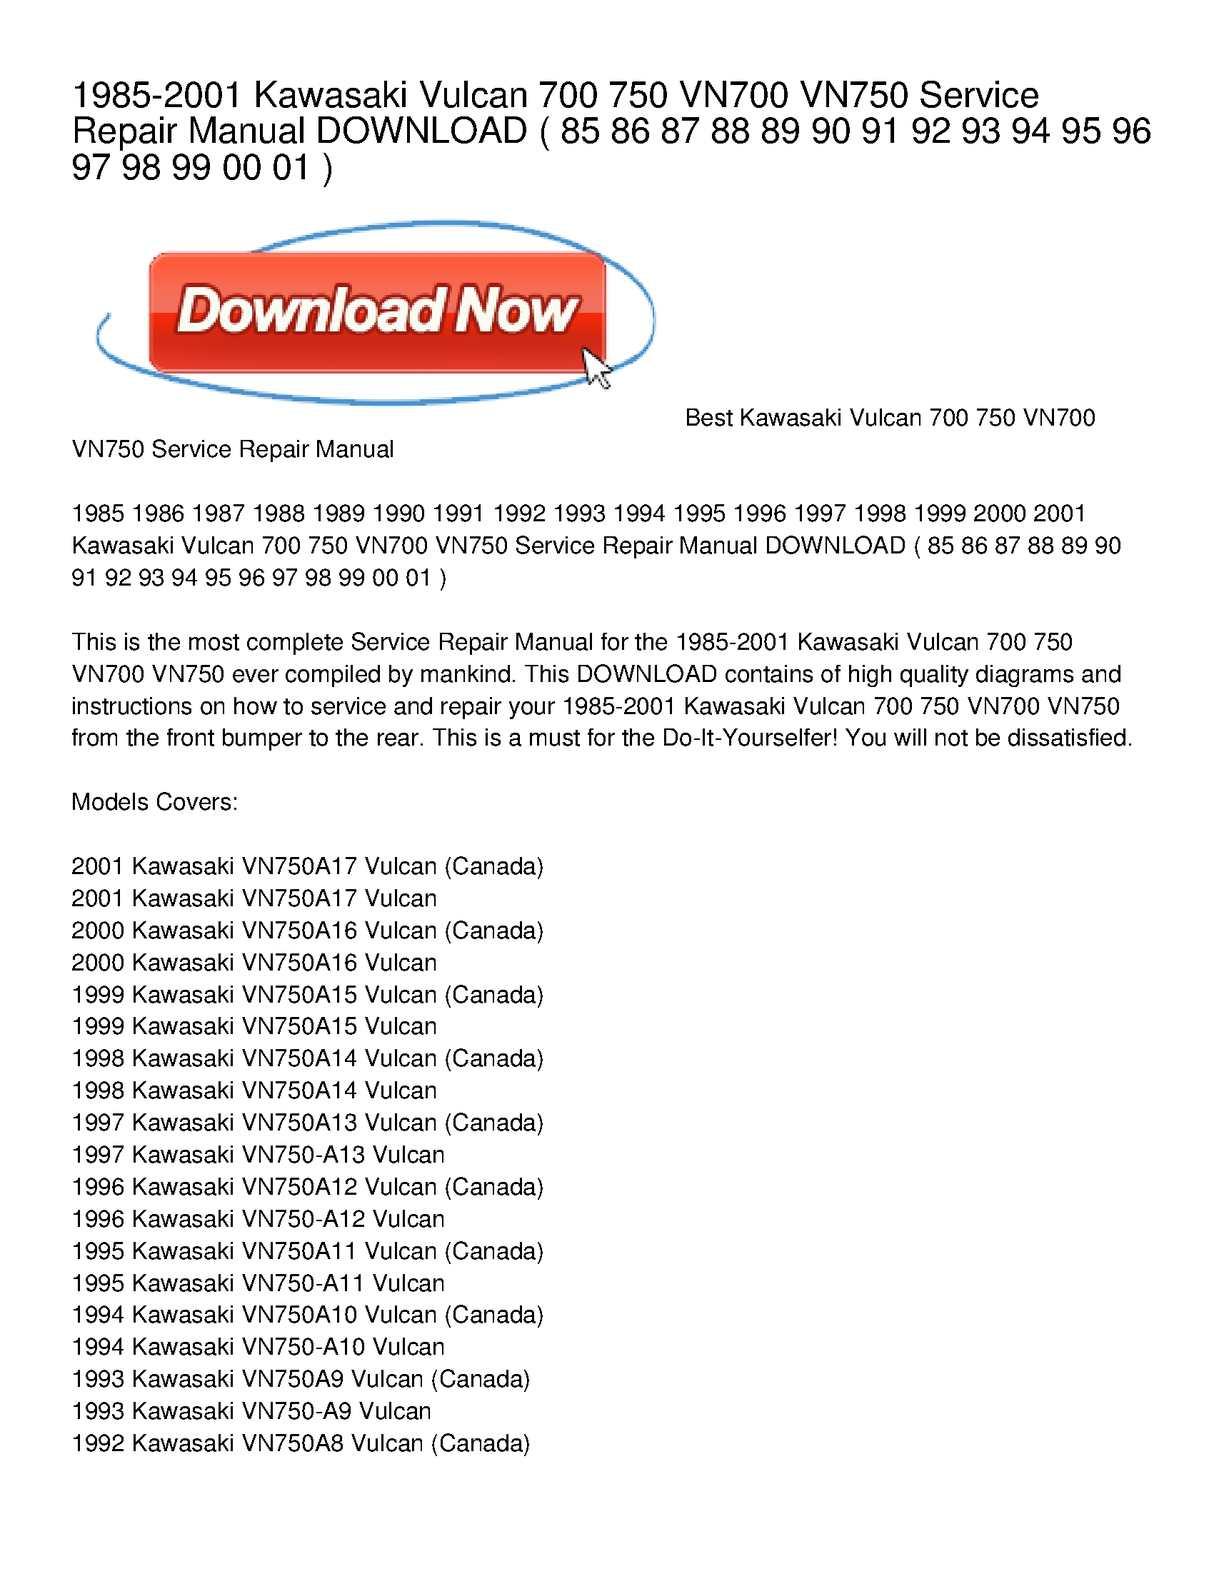 Calaméo - 1985-2001 Kawasaki Vulcan 700 750 VN700 VN750 Service Repair  Manual DOWNLOAD